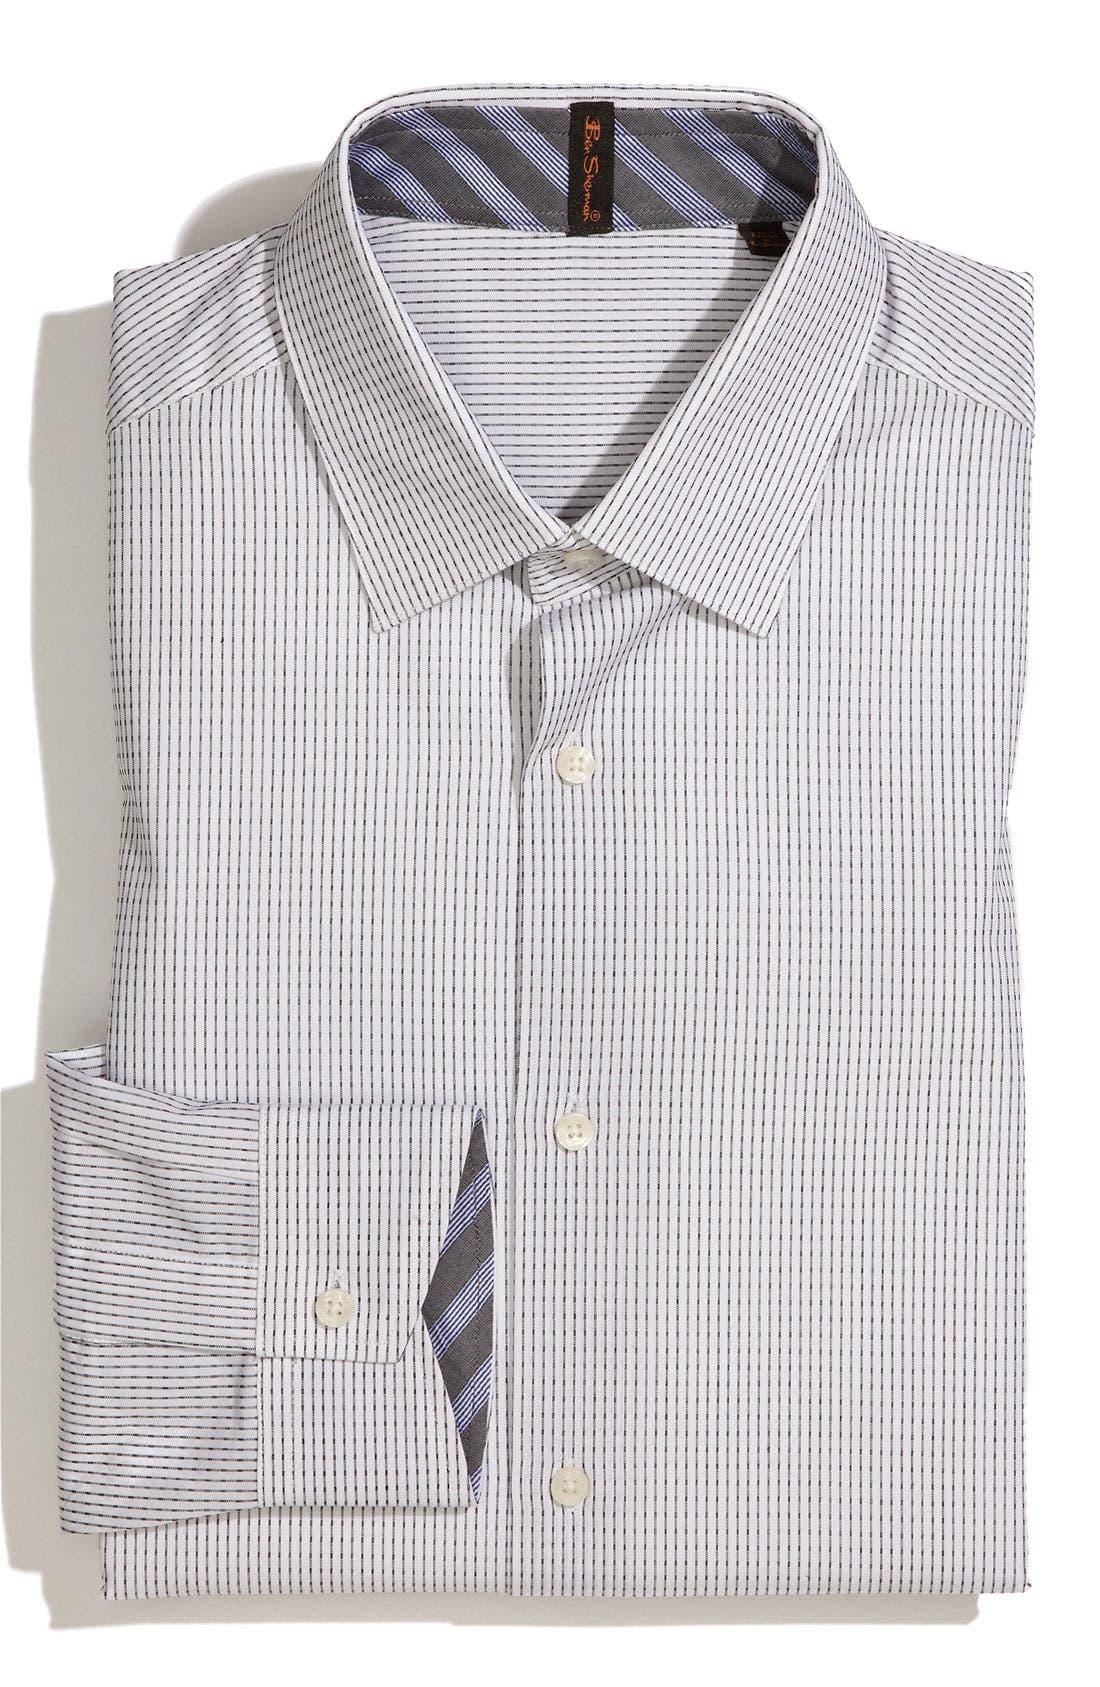 Main Image - Ben Sherman Trim Fit Dress Shirt